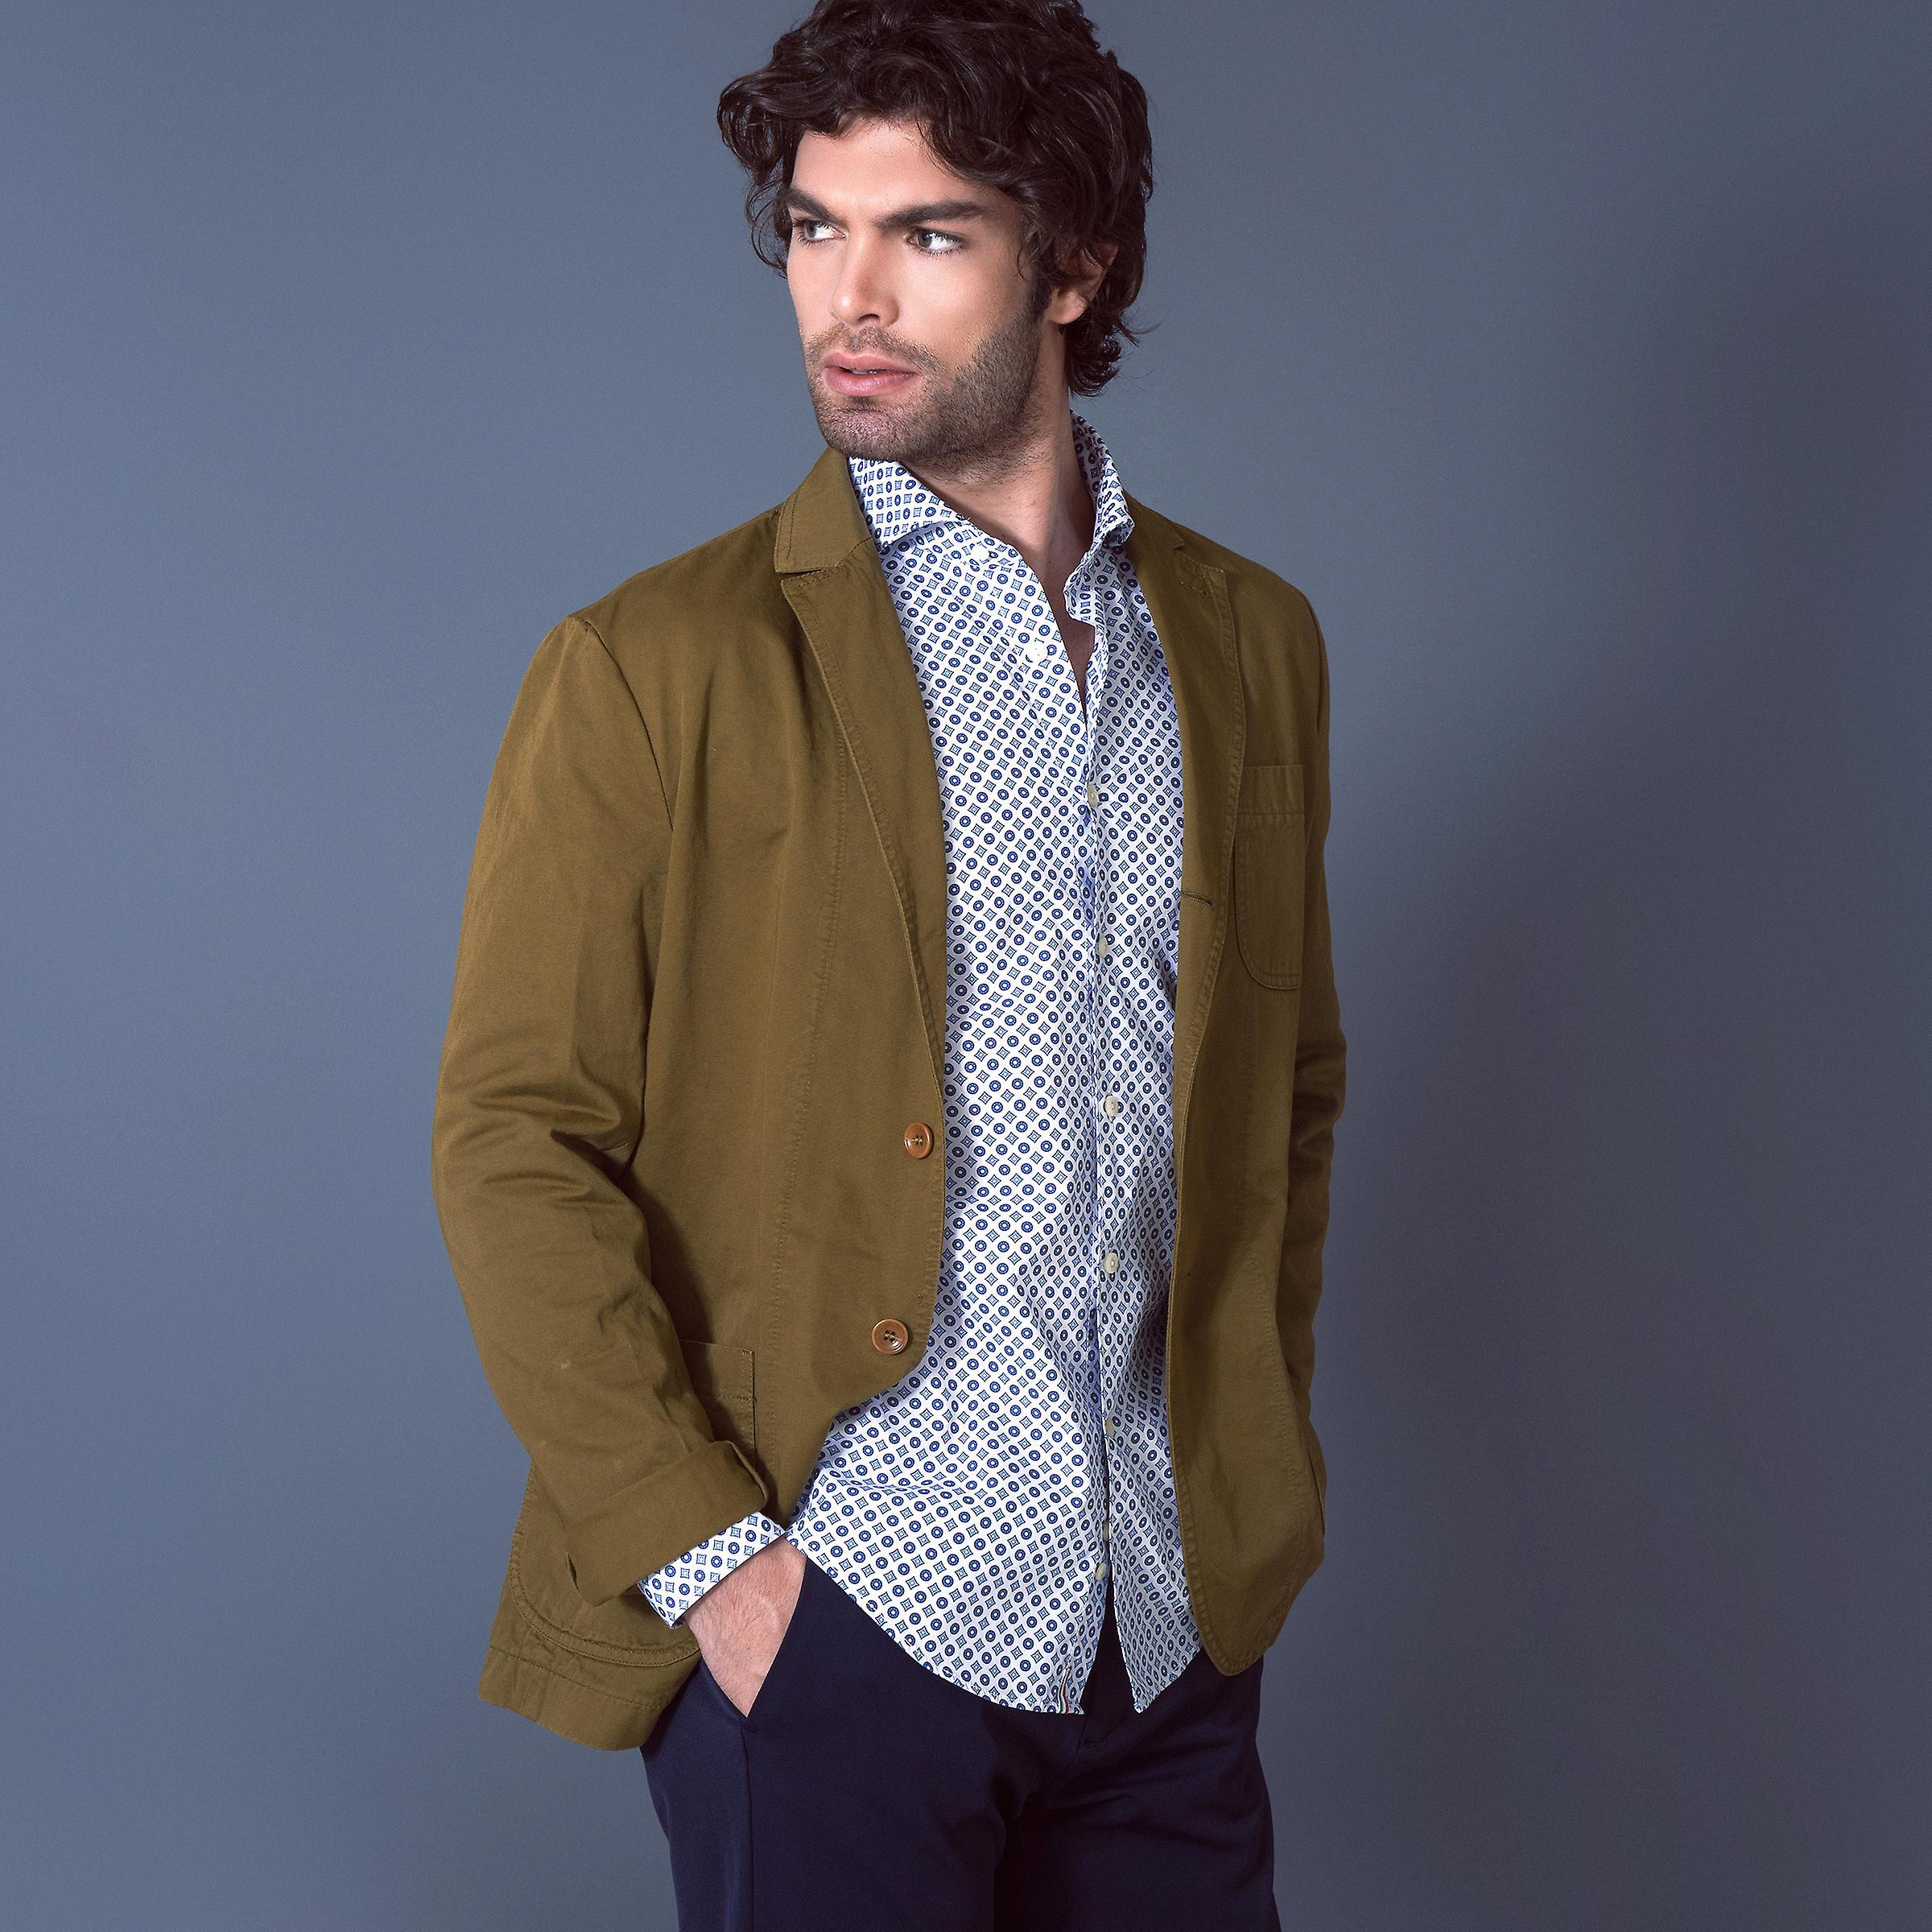 Fabio Giovanni Lizzano Shirt - Mens Italian Casual Stylish Shirt - Long Sleeve